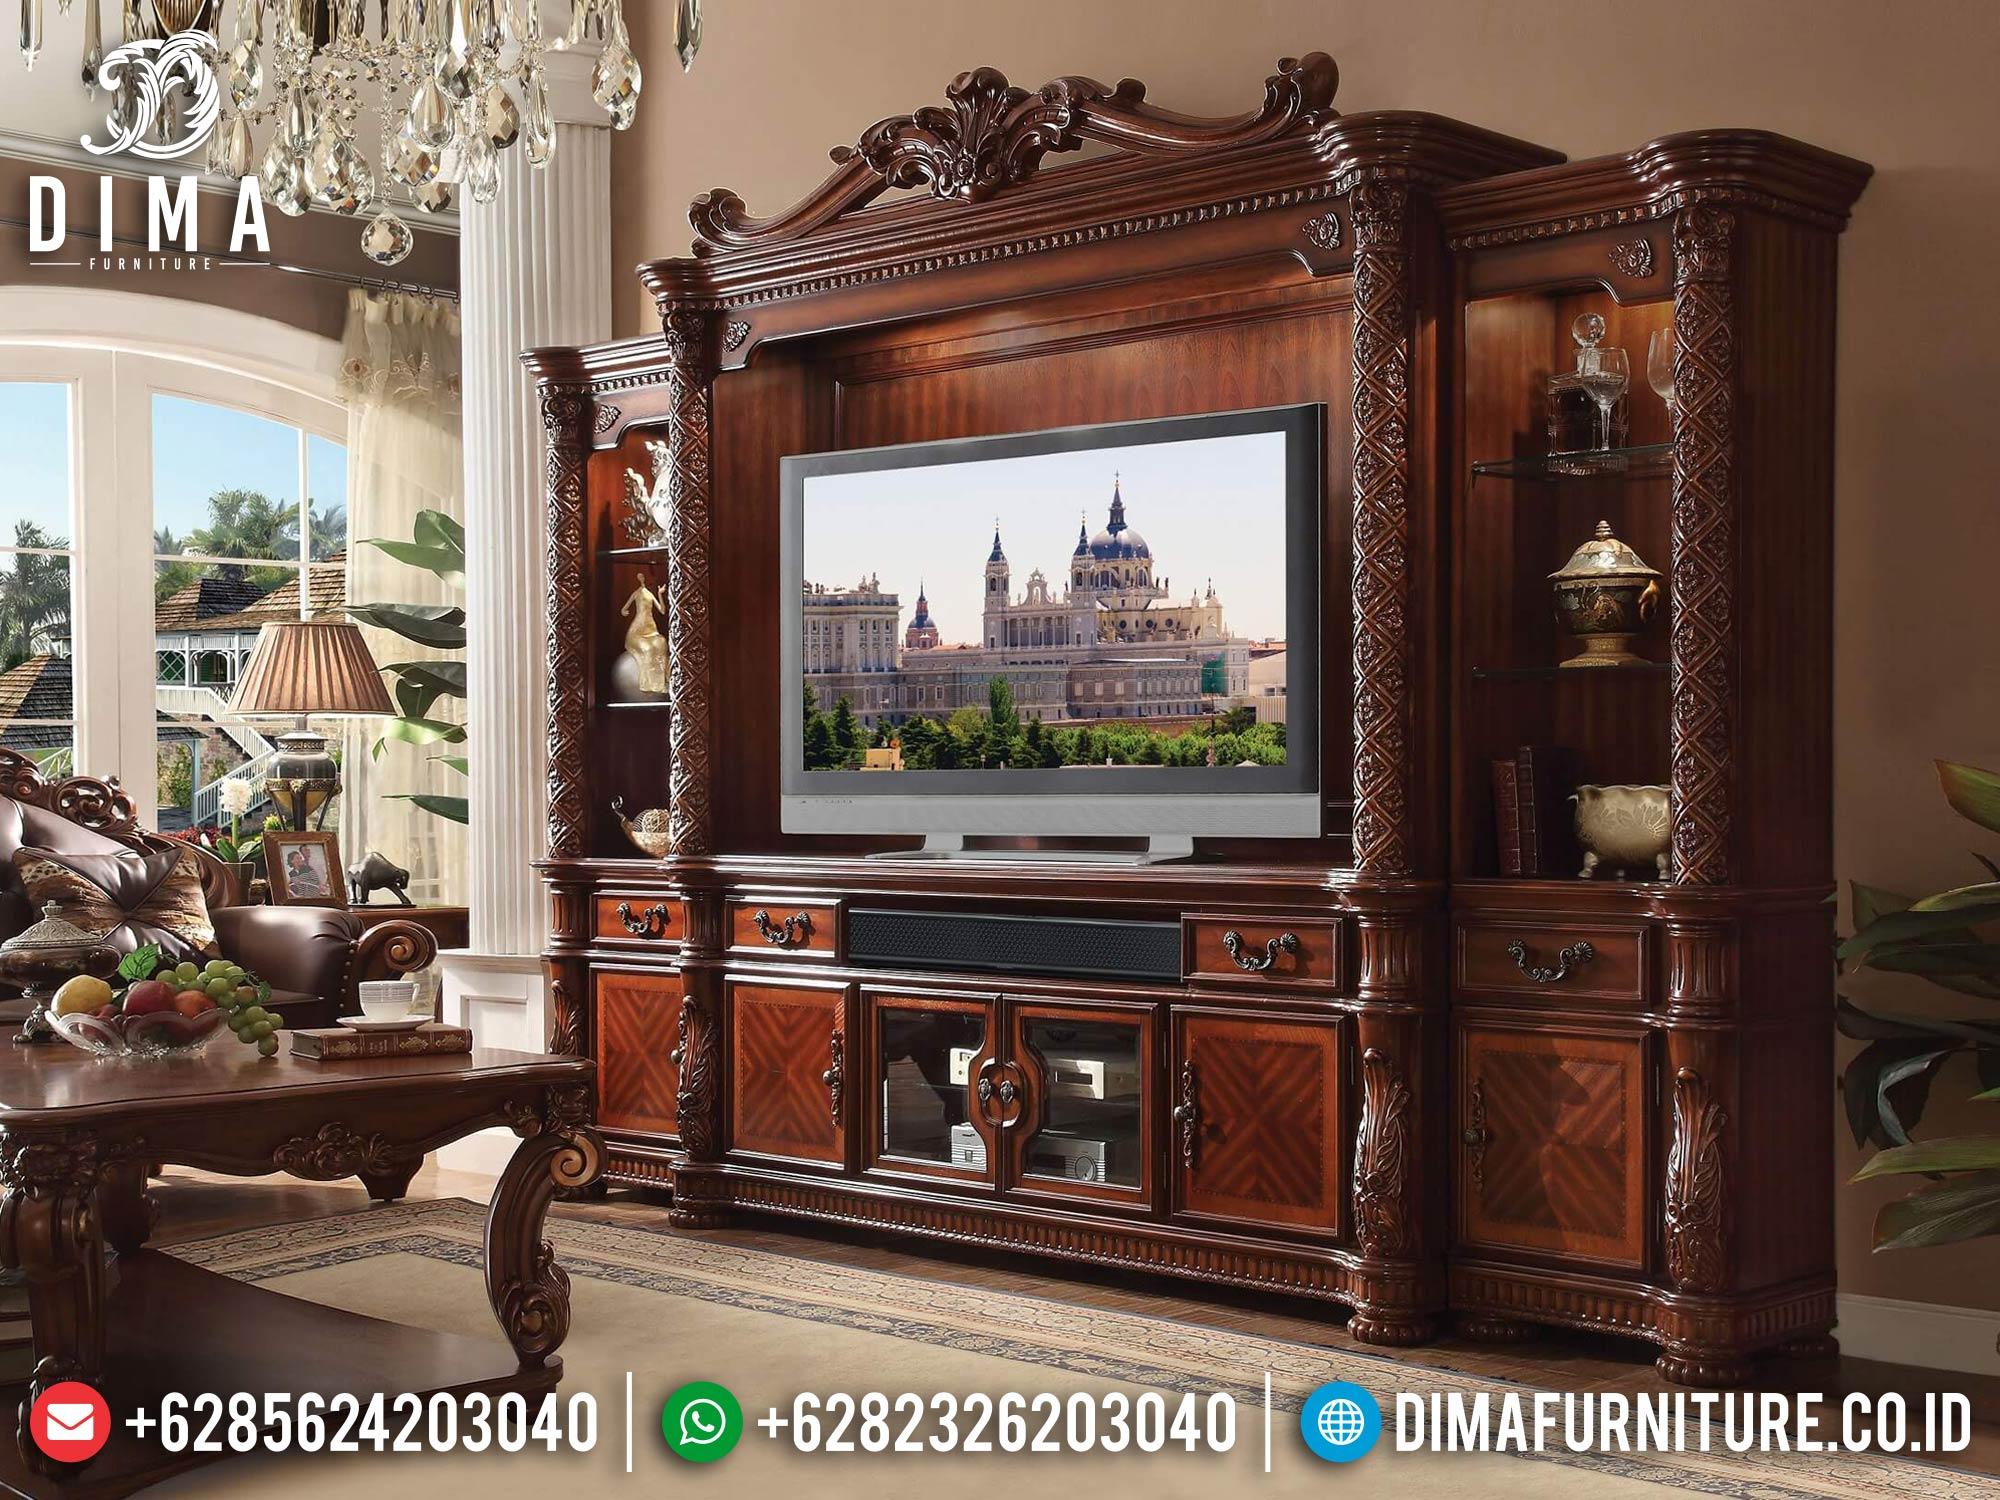 Bufet TV Mewah Jati Natural Kombinasi Luxury Set New Design 2021 TTJ-1651